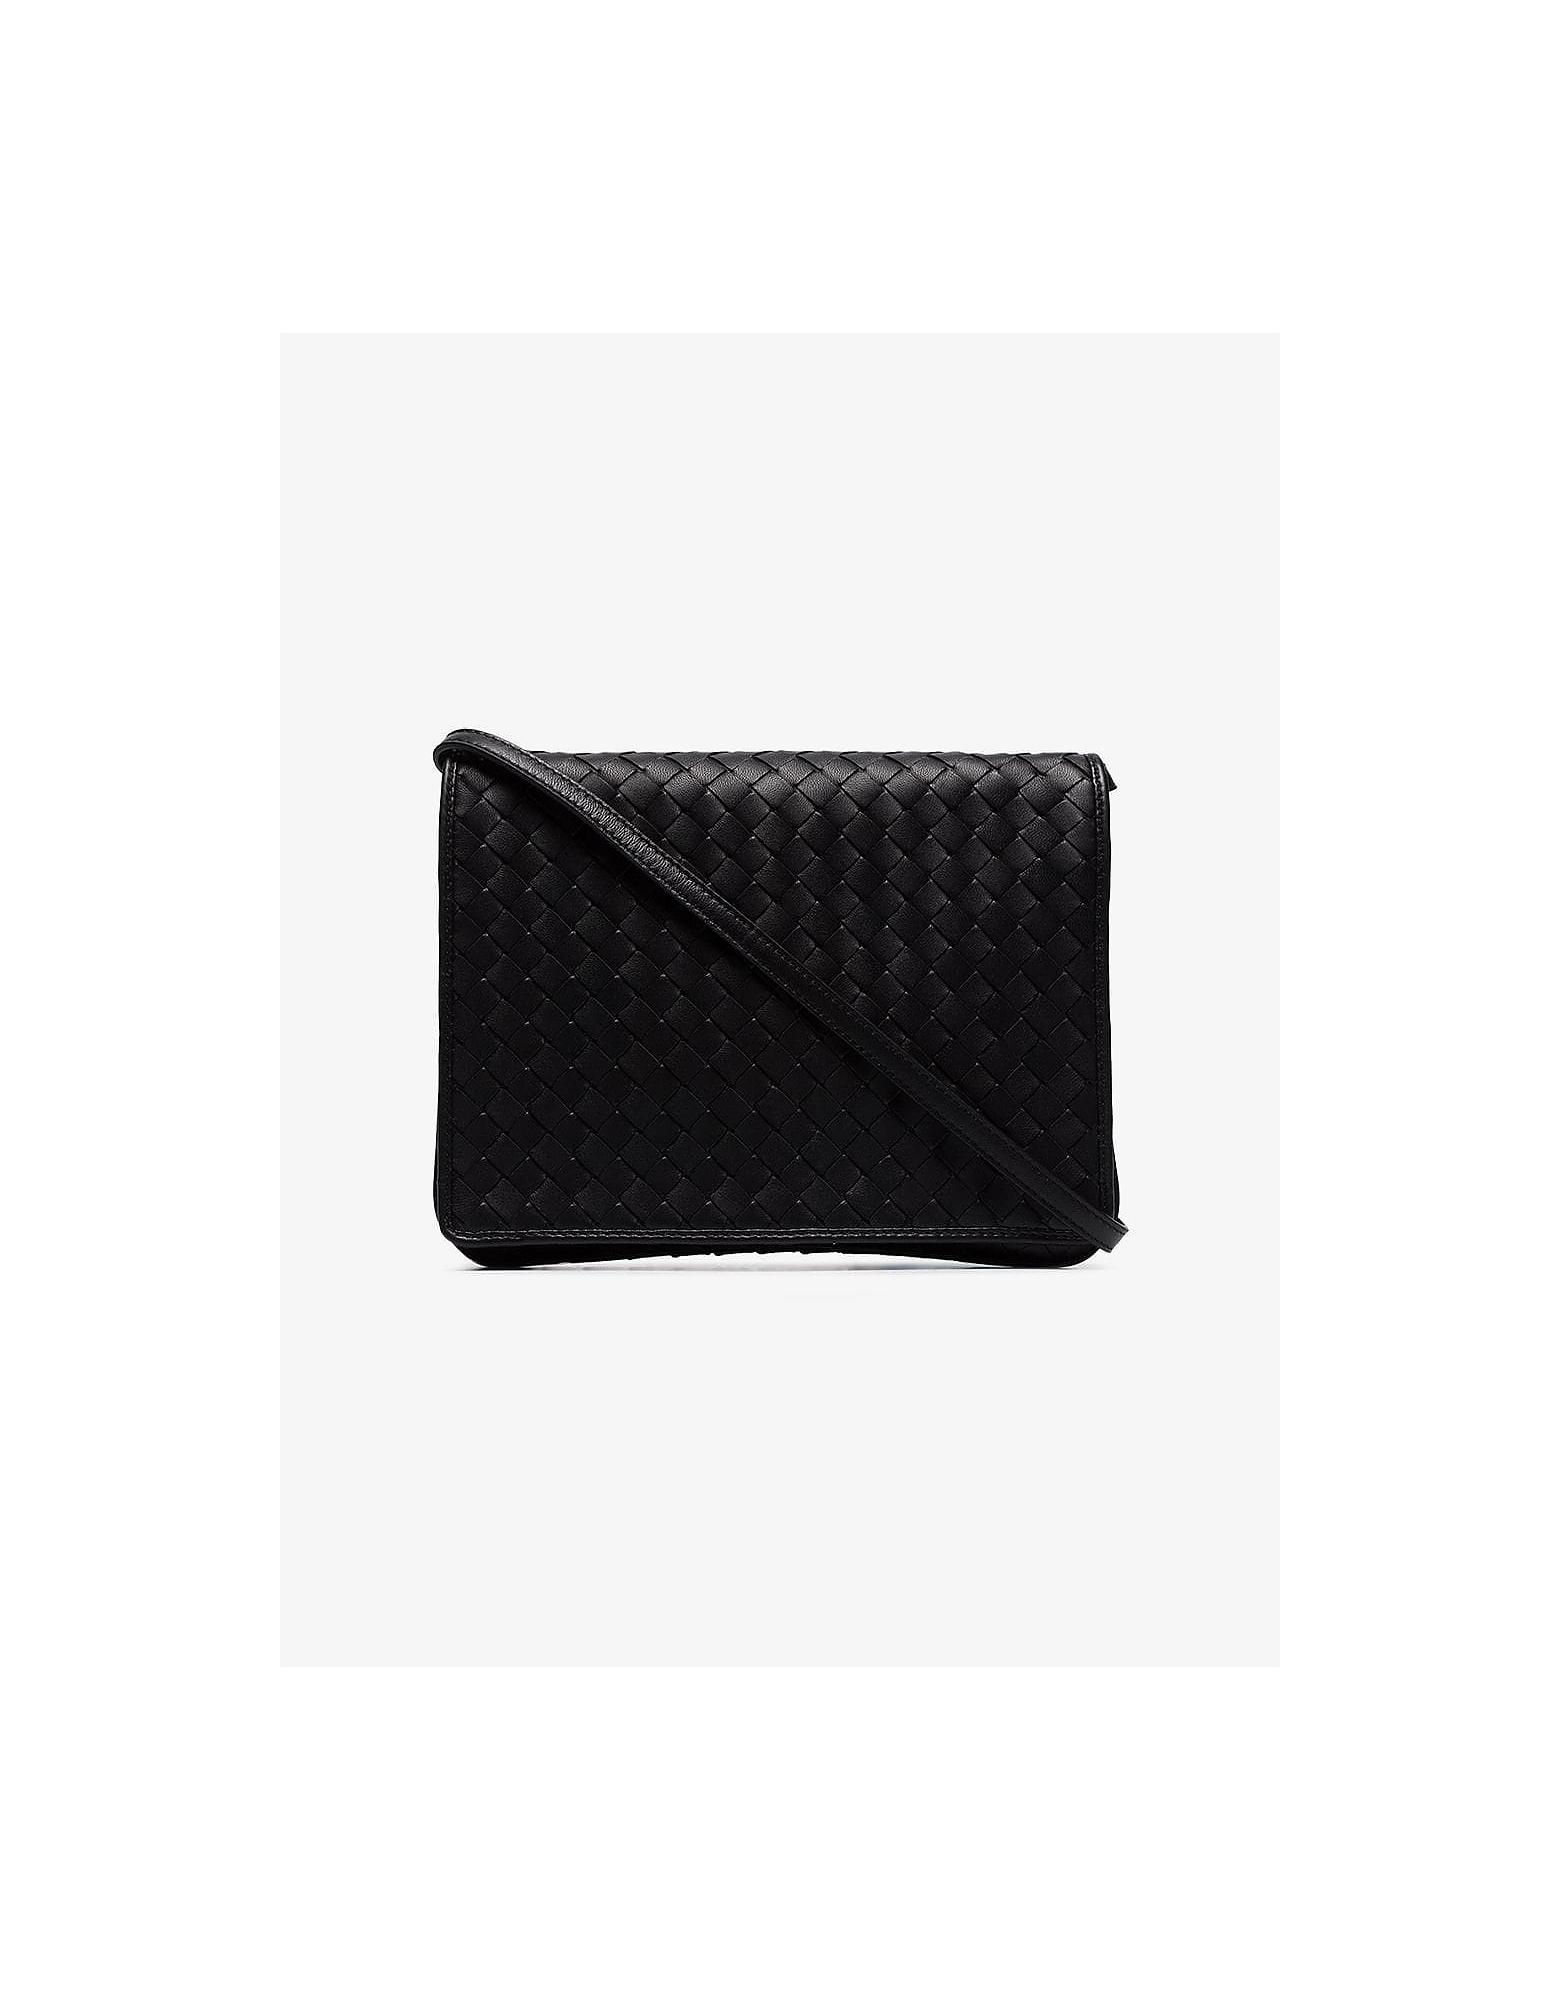 Bottega Veneta Designer Handbags, Black Intrecciato Leather Cross Body Bag